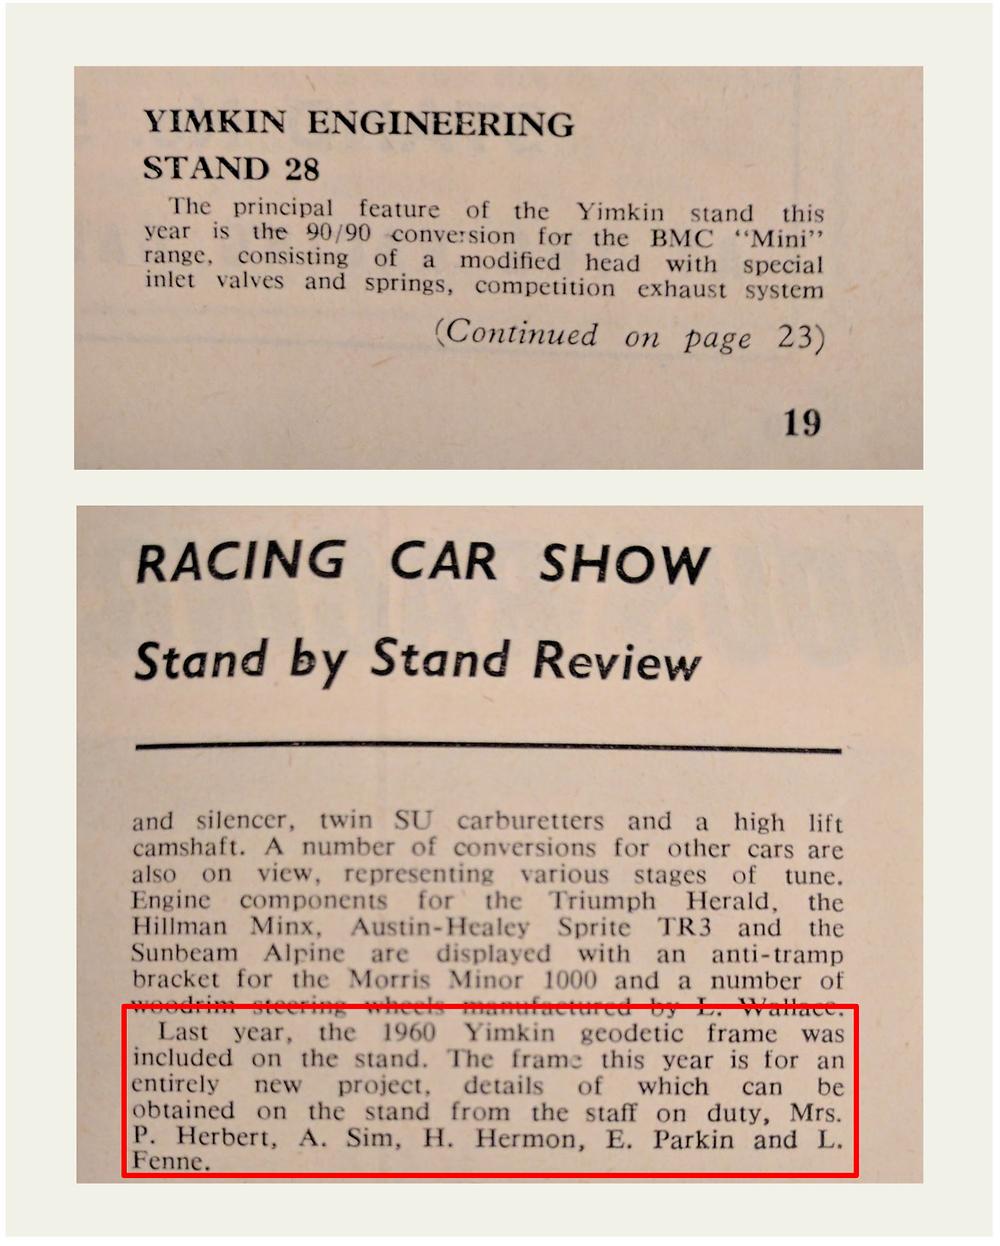 Motor Racing Magazine, Racing Car Show Issue, Yimkin, Don Sim